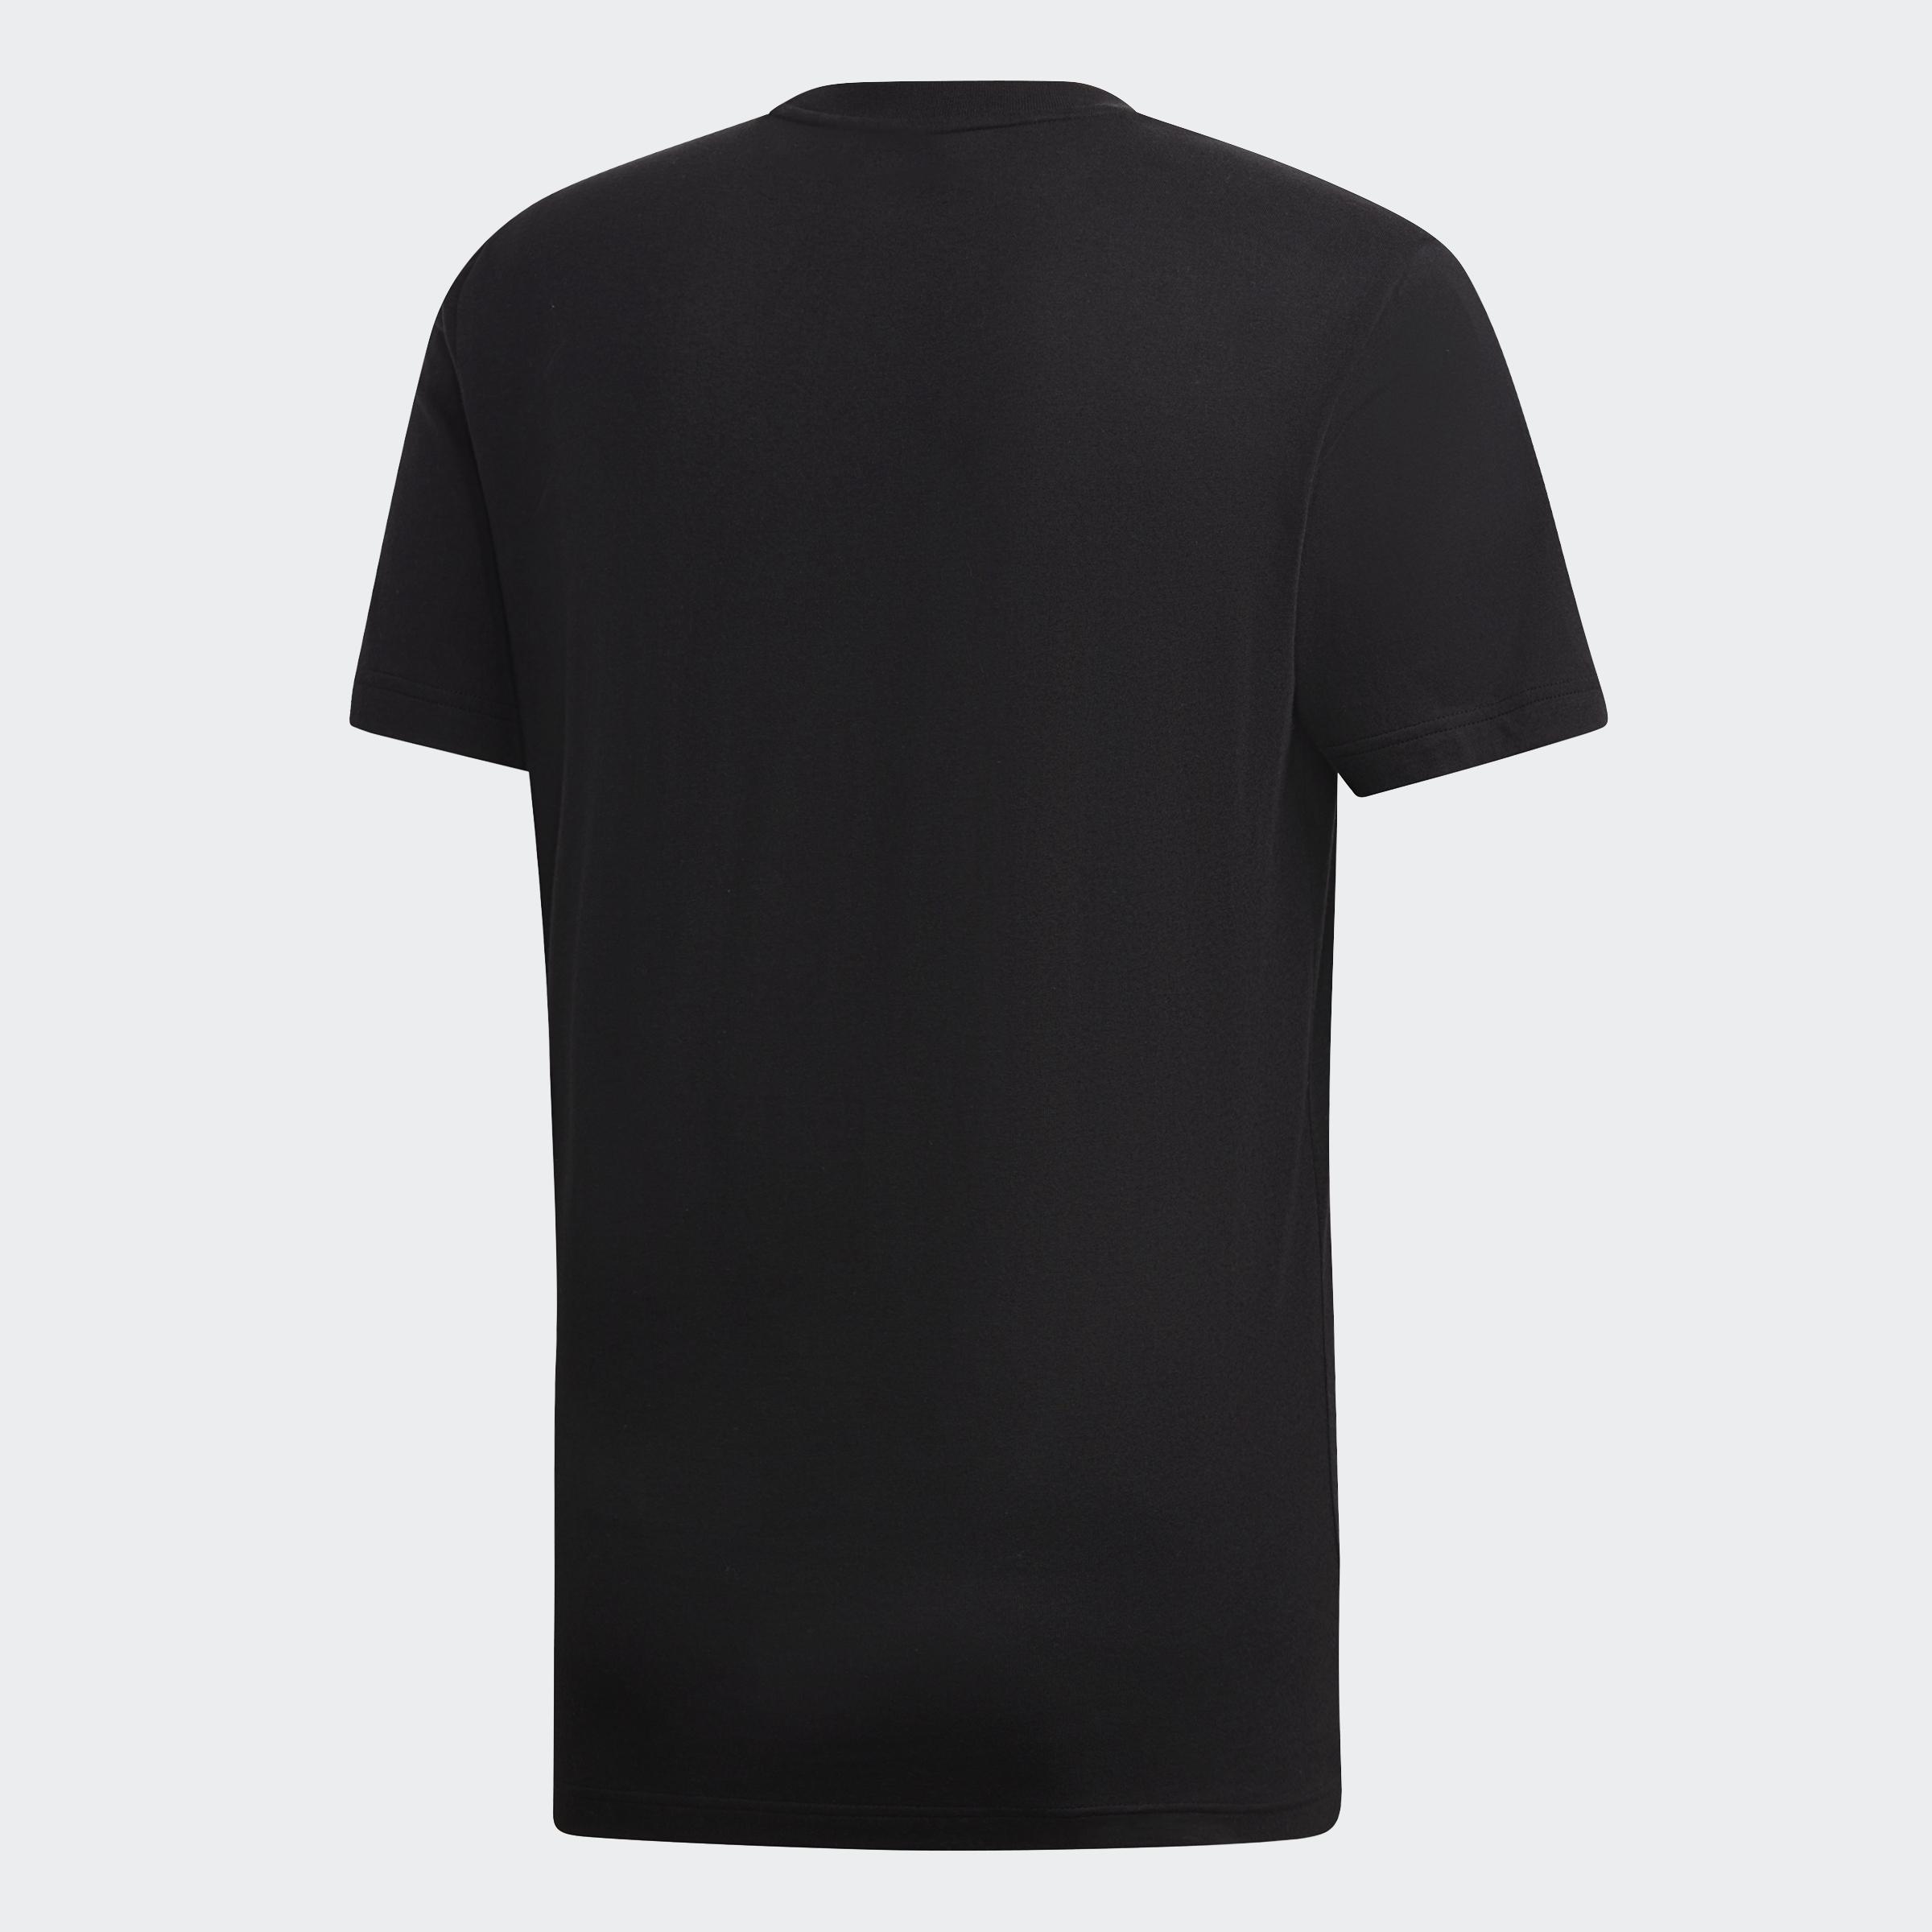 adidas-Must-Haves-Badge-of-Sport-Tee-Men-039-s-Shirts thumbnail 8